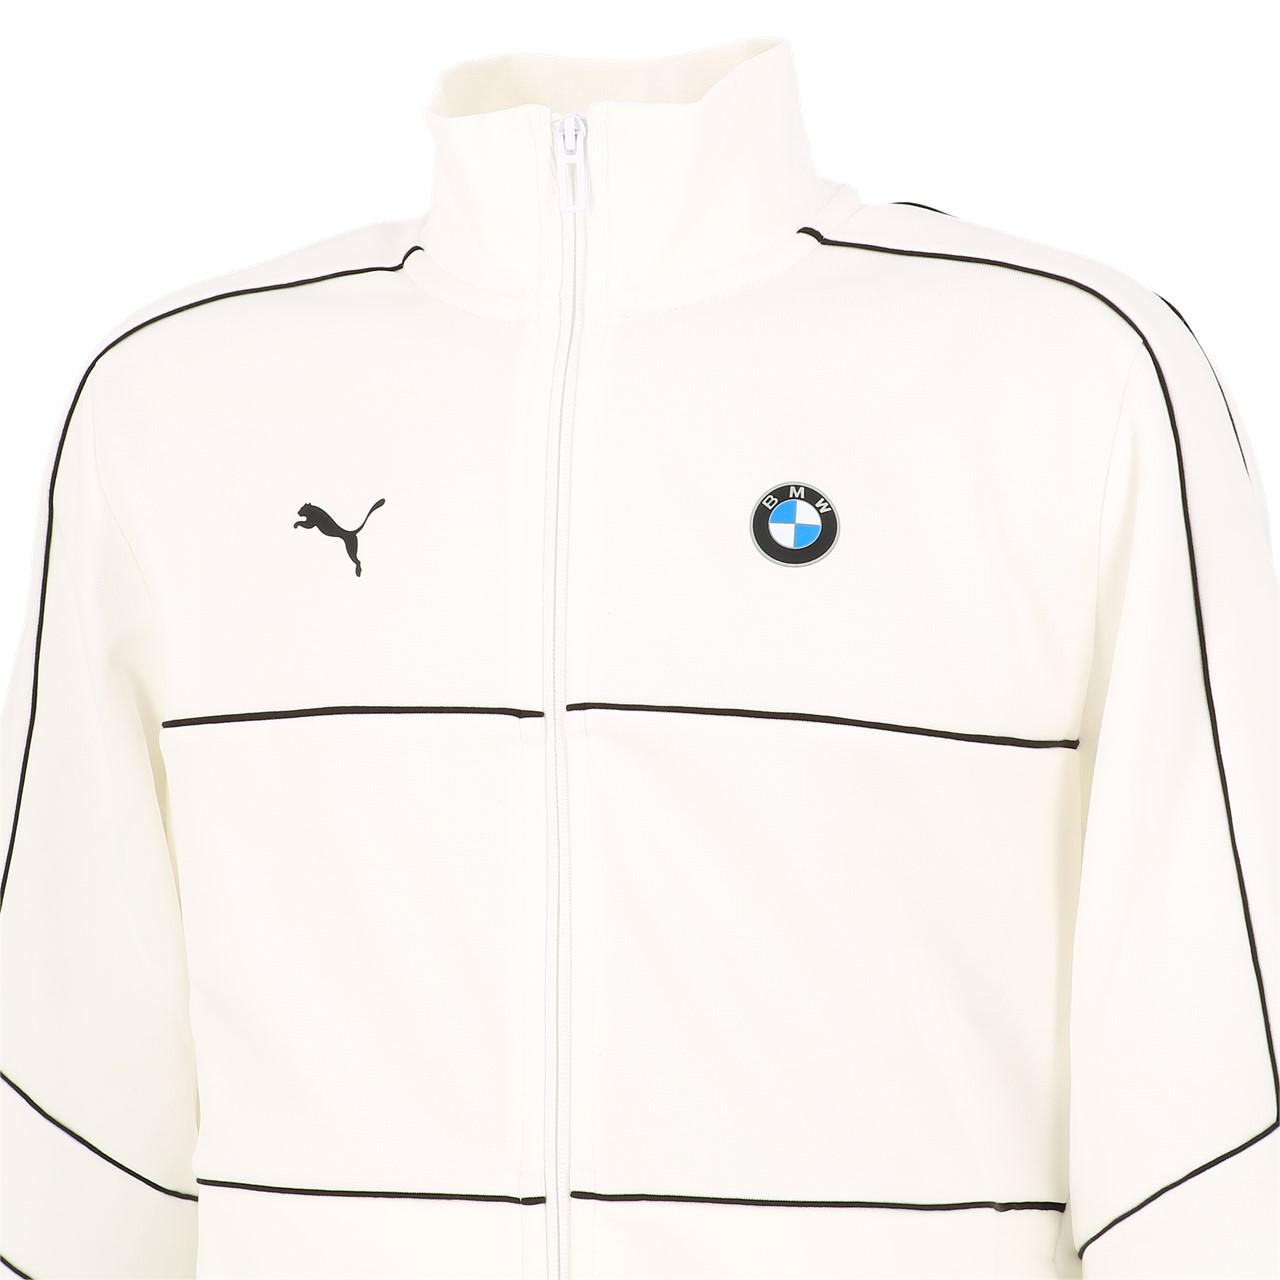 Jacken-Puma-BMW-Mms-t7-Wht-Jacket-Weiss-19707-Neu Indexbild 2